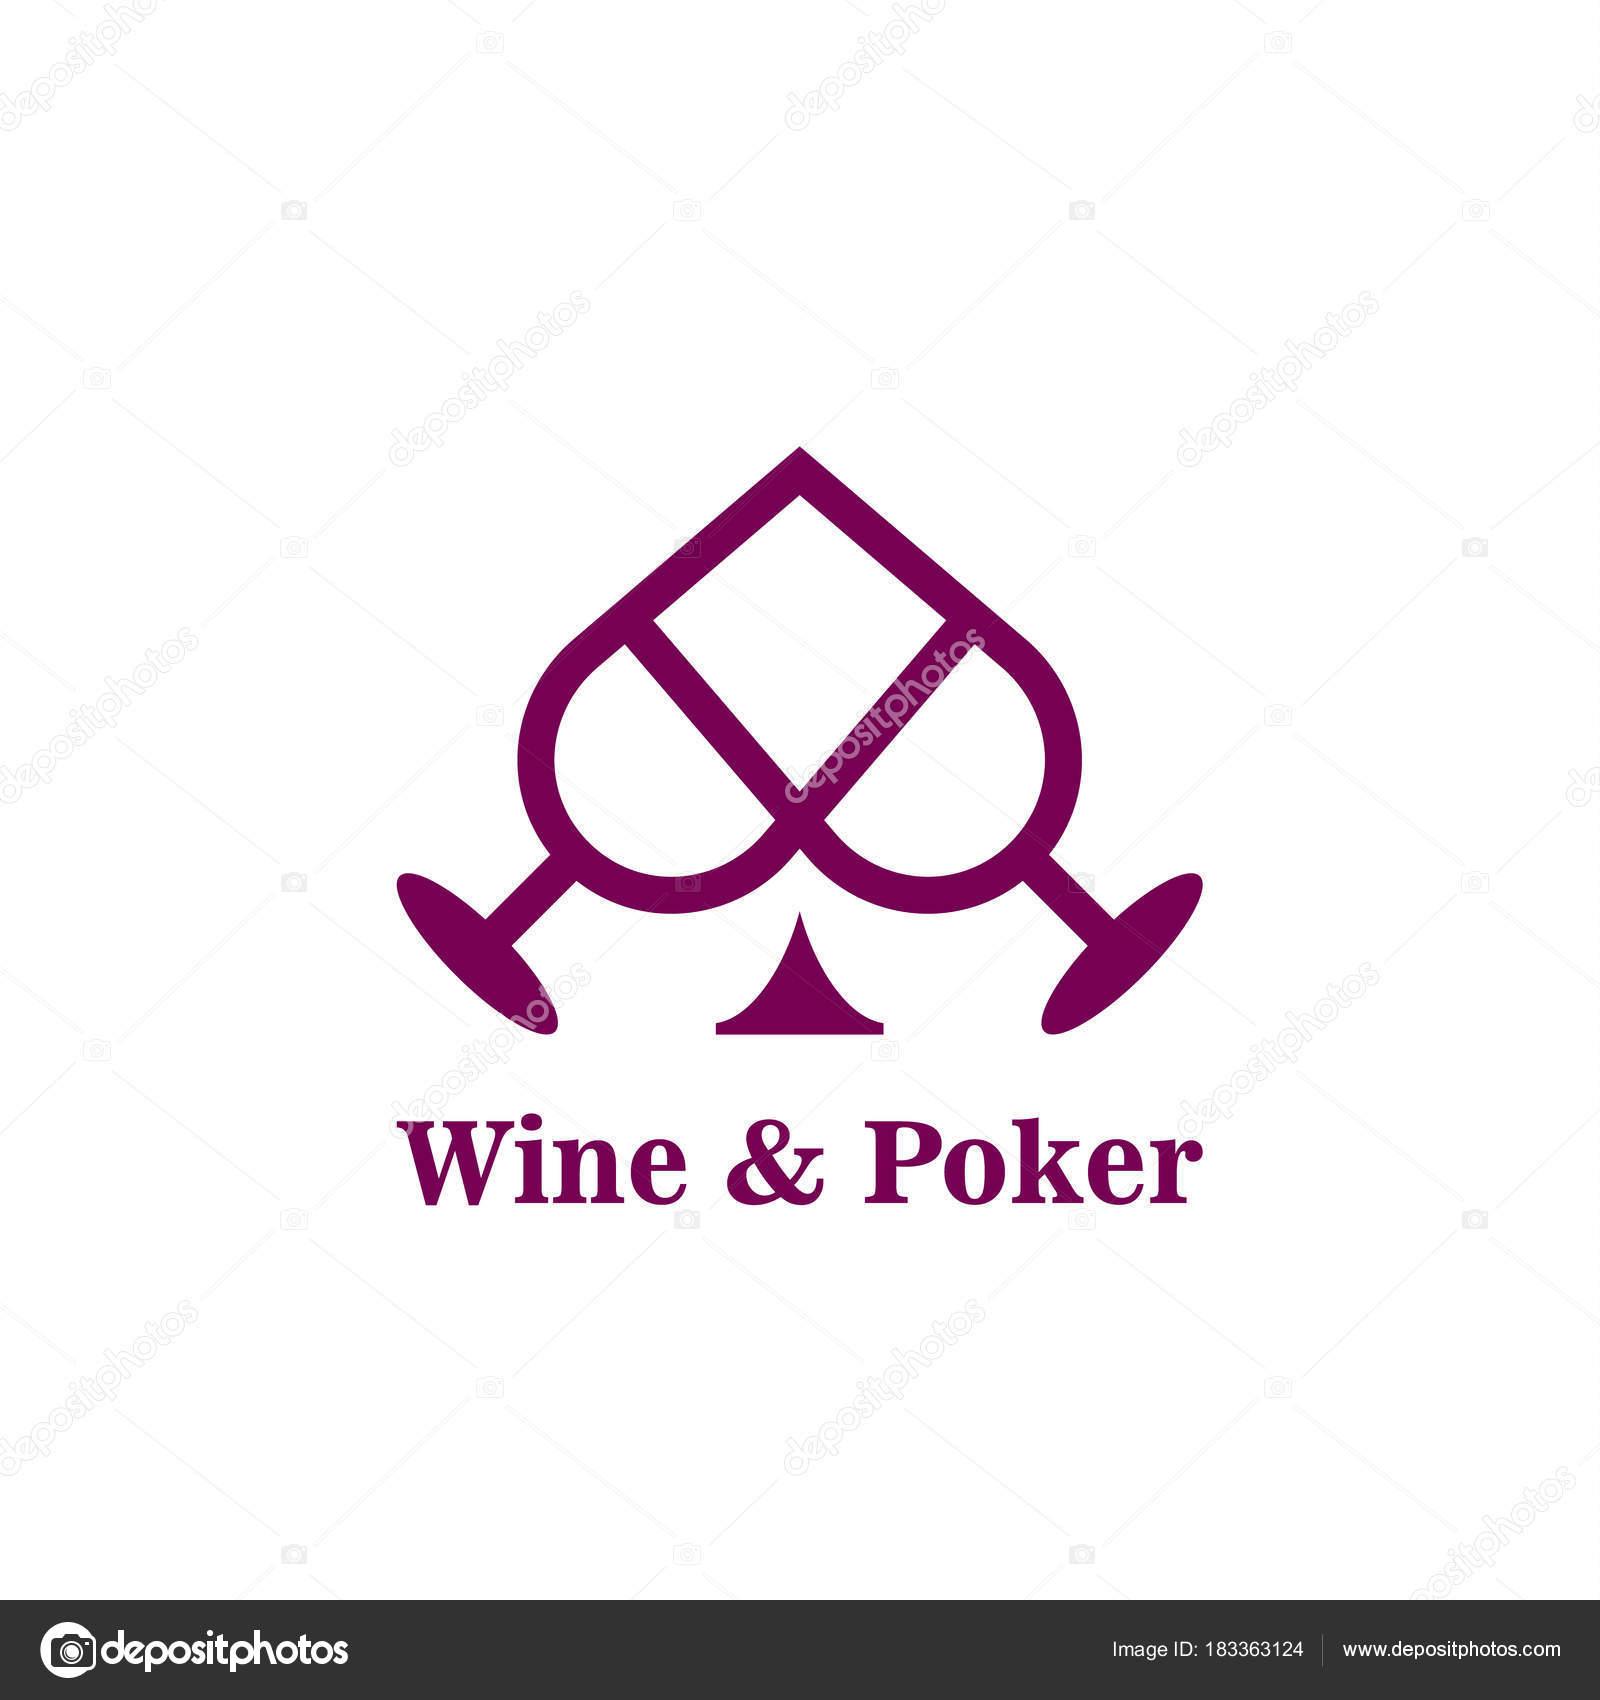 Costume De Pic Et Verres A Vin Abstraite Icone Modele Logo Poker Idee Pour La Carte Visite Du Casino Identite Marque Dentreprise